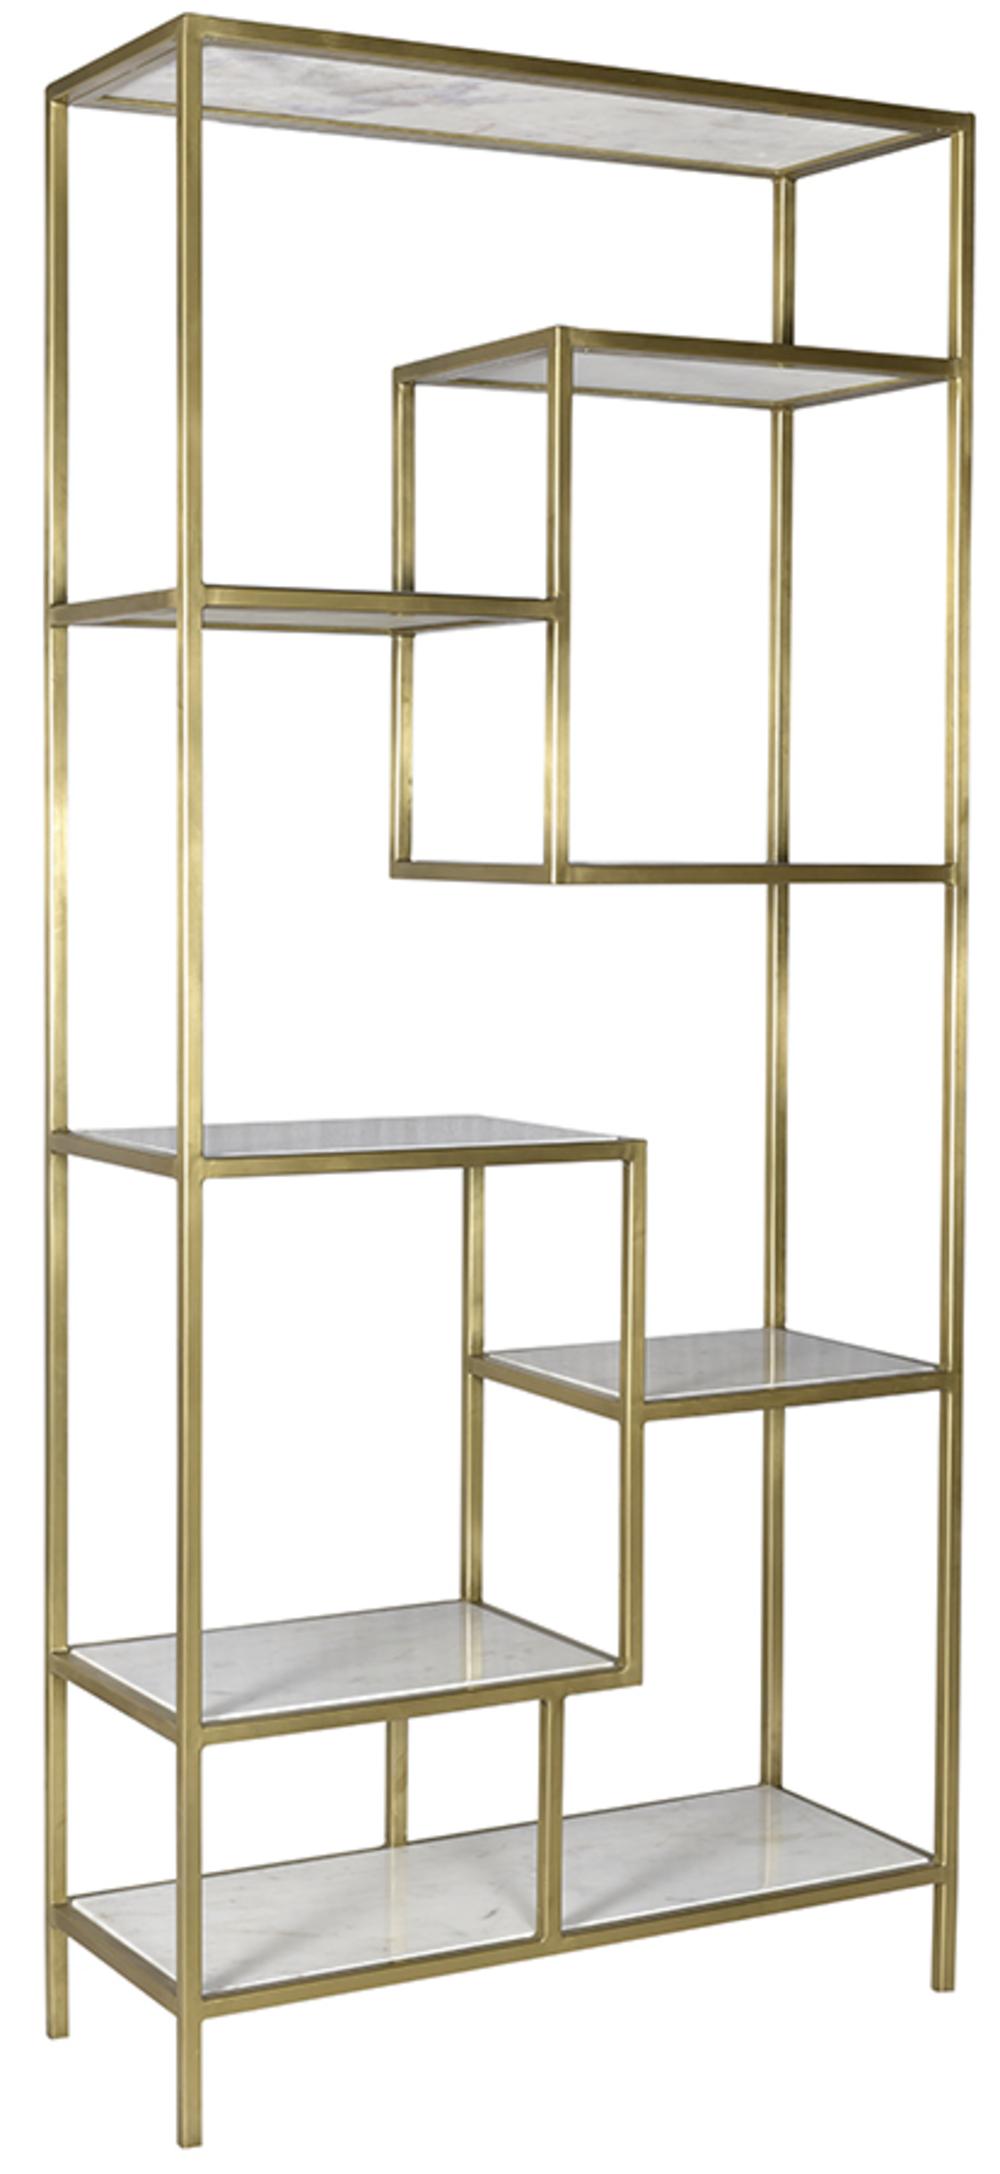 Dovetail Furniture - Swanson Bookshelf